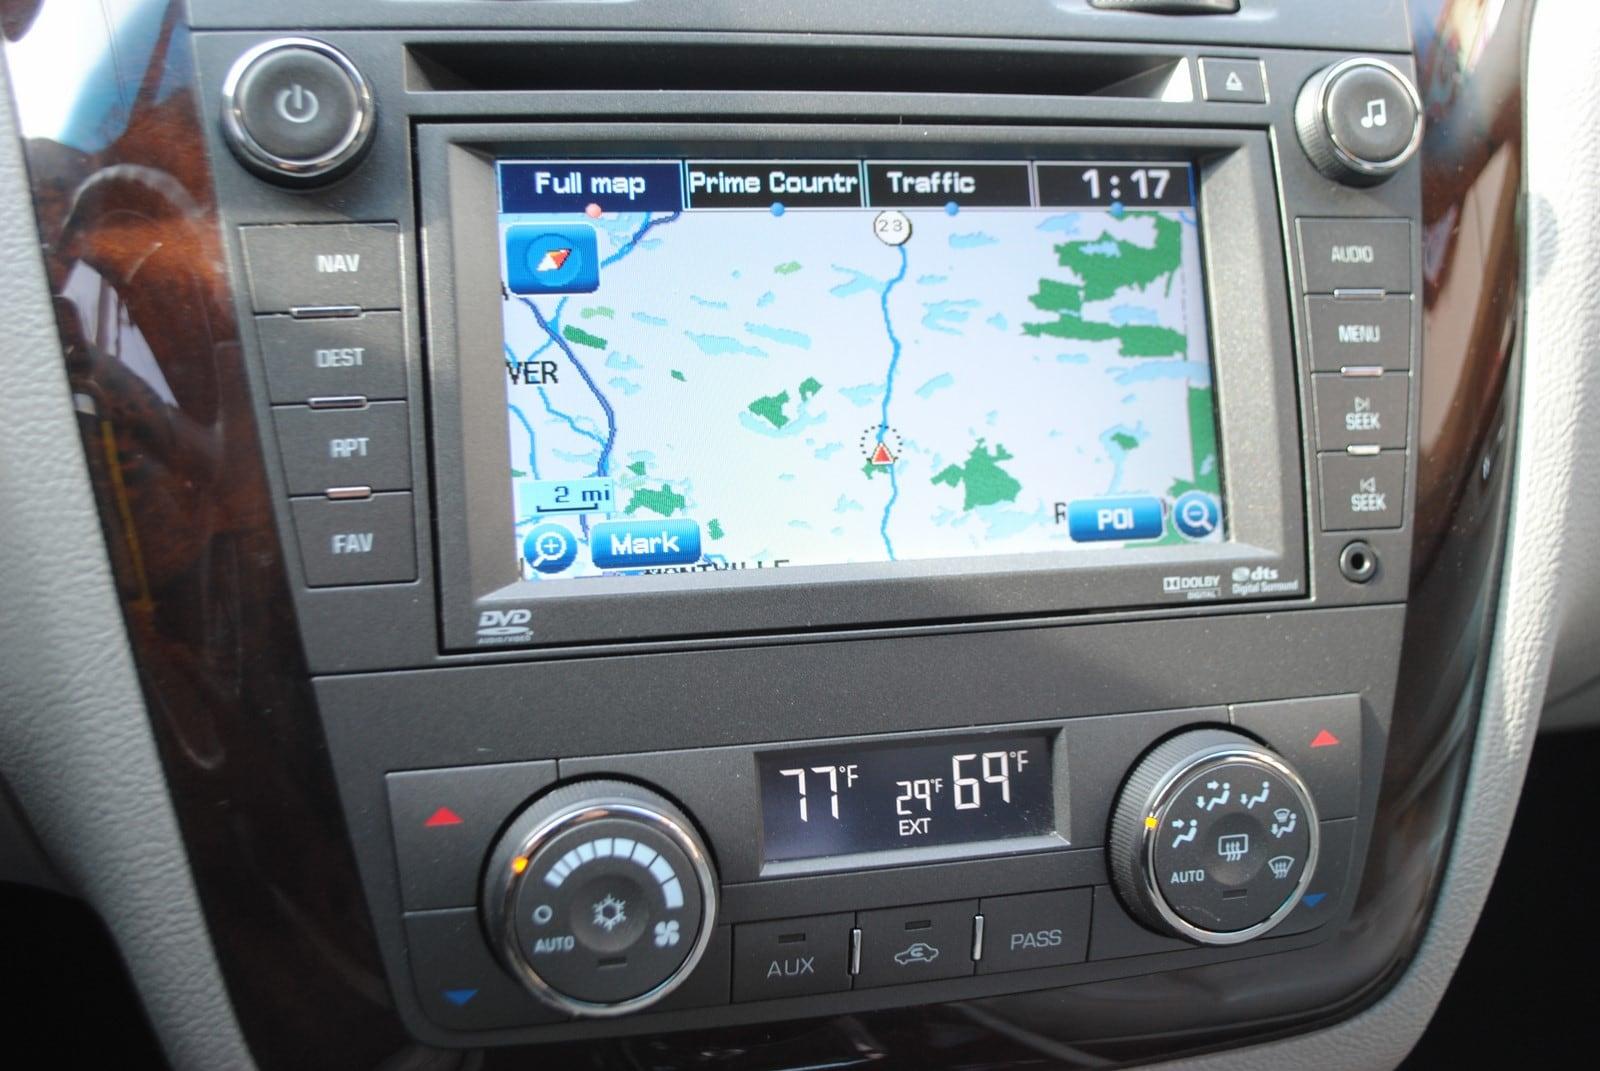 Used 2011 Cadillac Dts For Sale At Ramsey Corp Vin 1g6kh5e64bu118577rhramseycorp: Cadillac Dts Navigation Radio At Gmaili.net